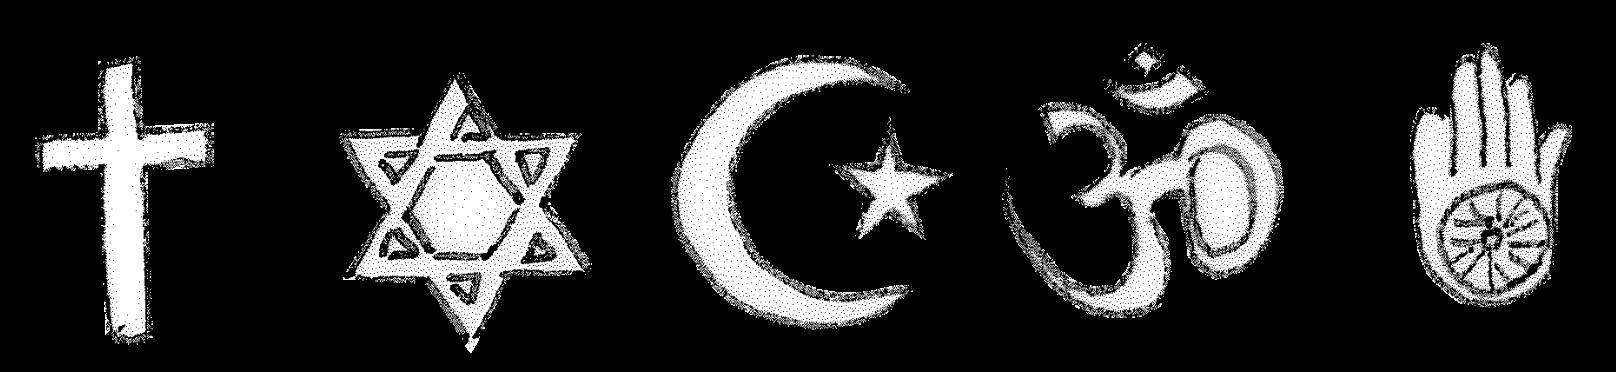 some world religious symbols